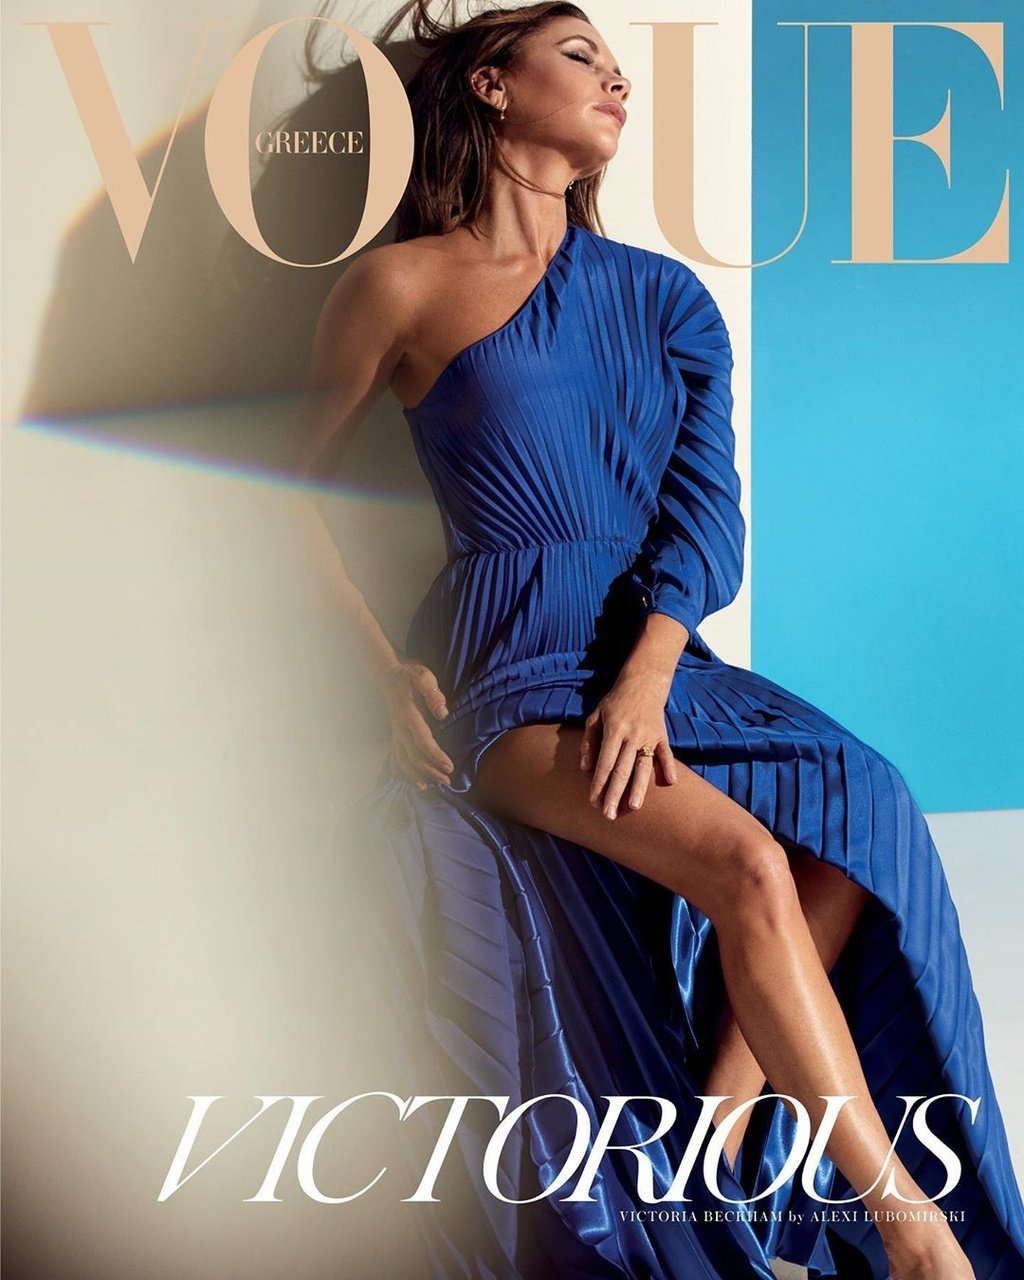 Victoria Beckham khoe chan dai anh 2